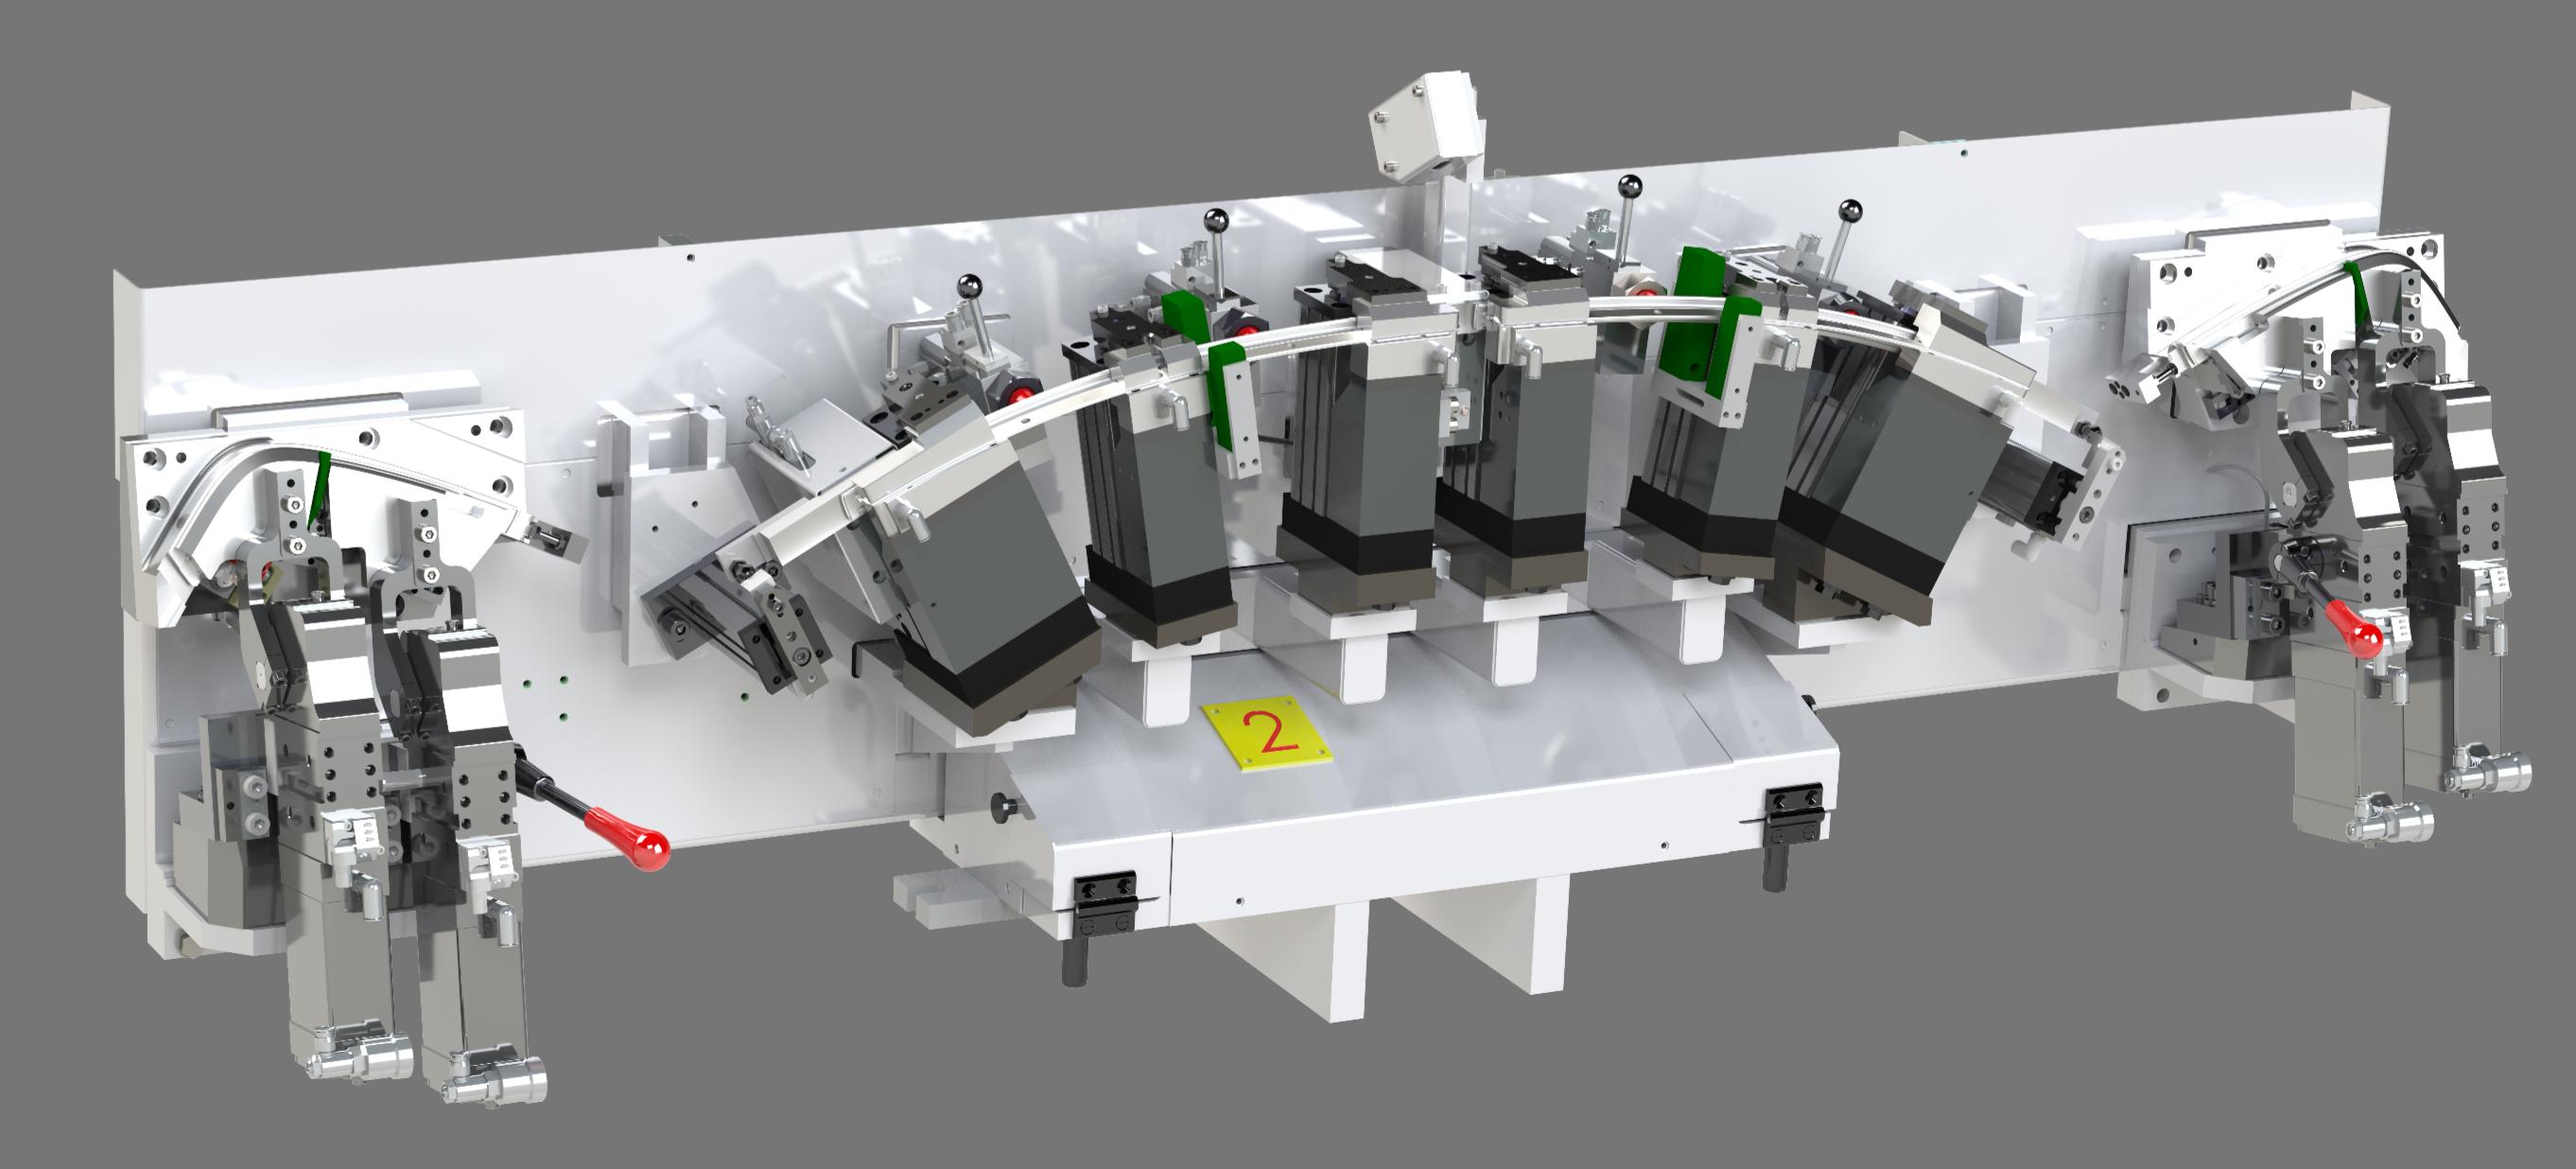 Combi 3-fold milling fixture